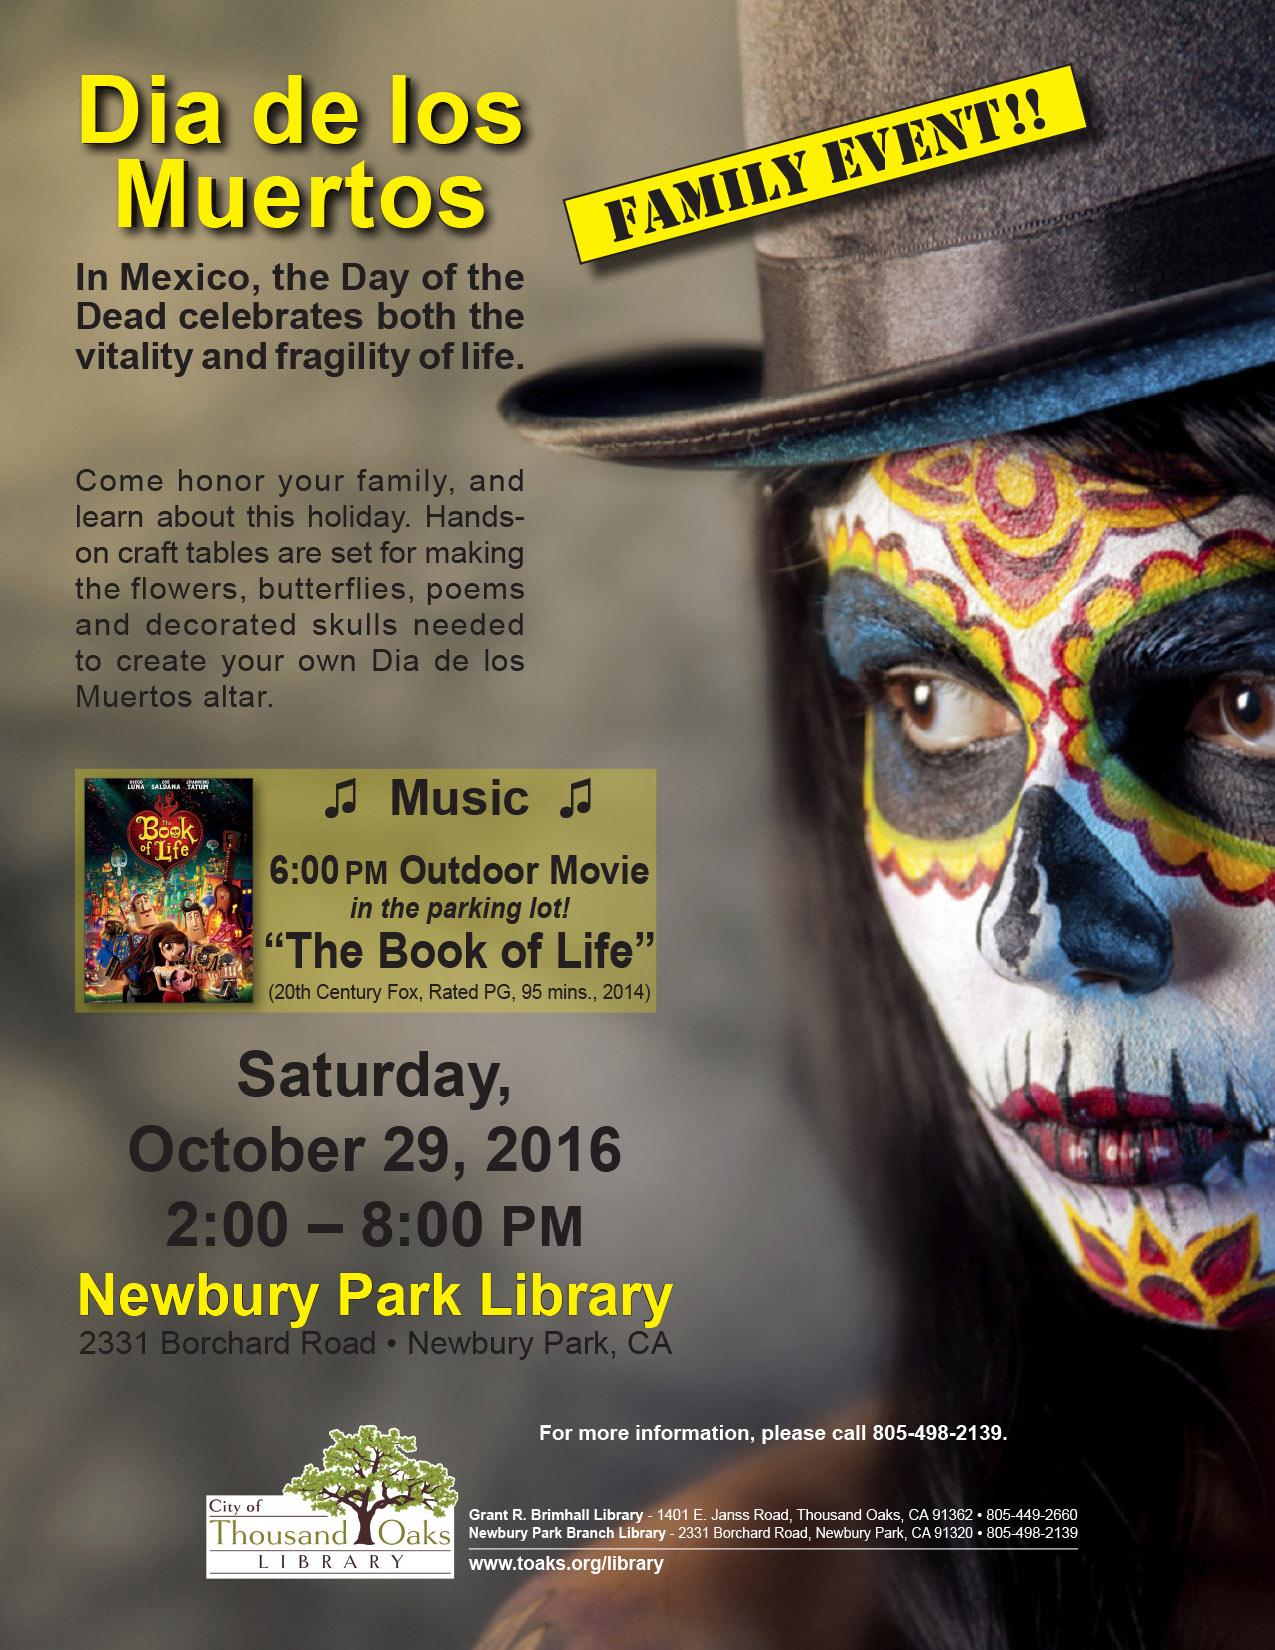 dia de los muertos oct 2016 - Halloween Costumes Thousand Oaks